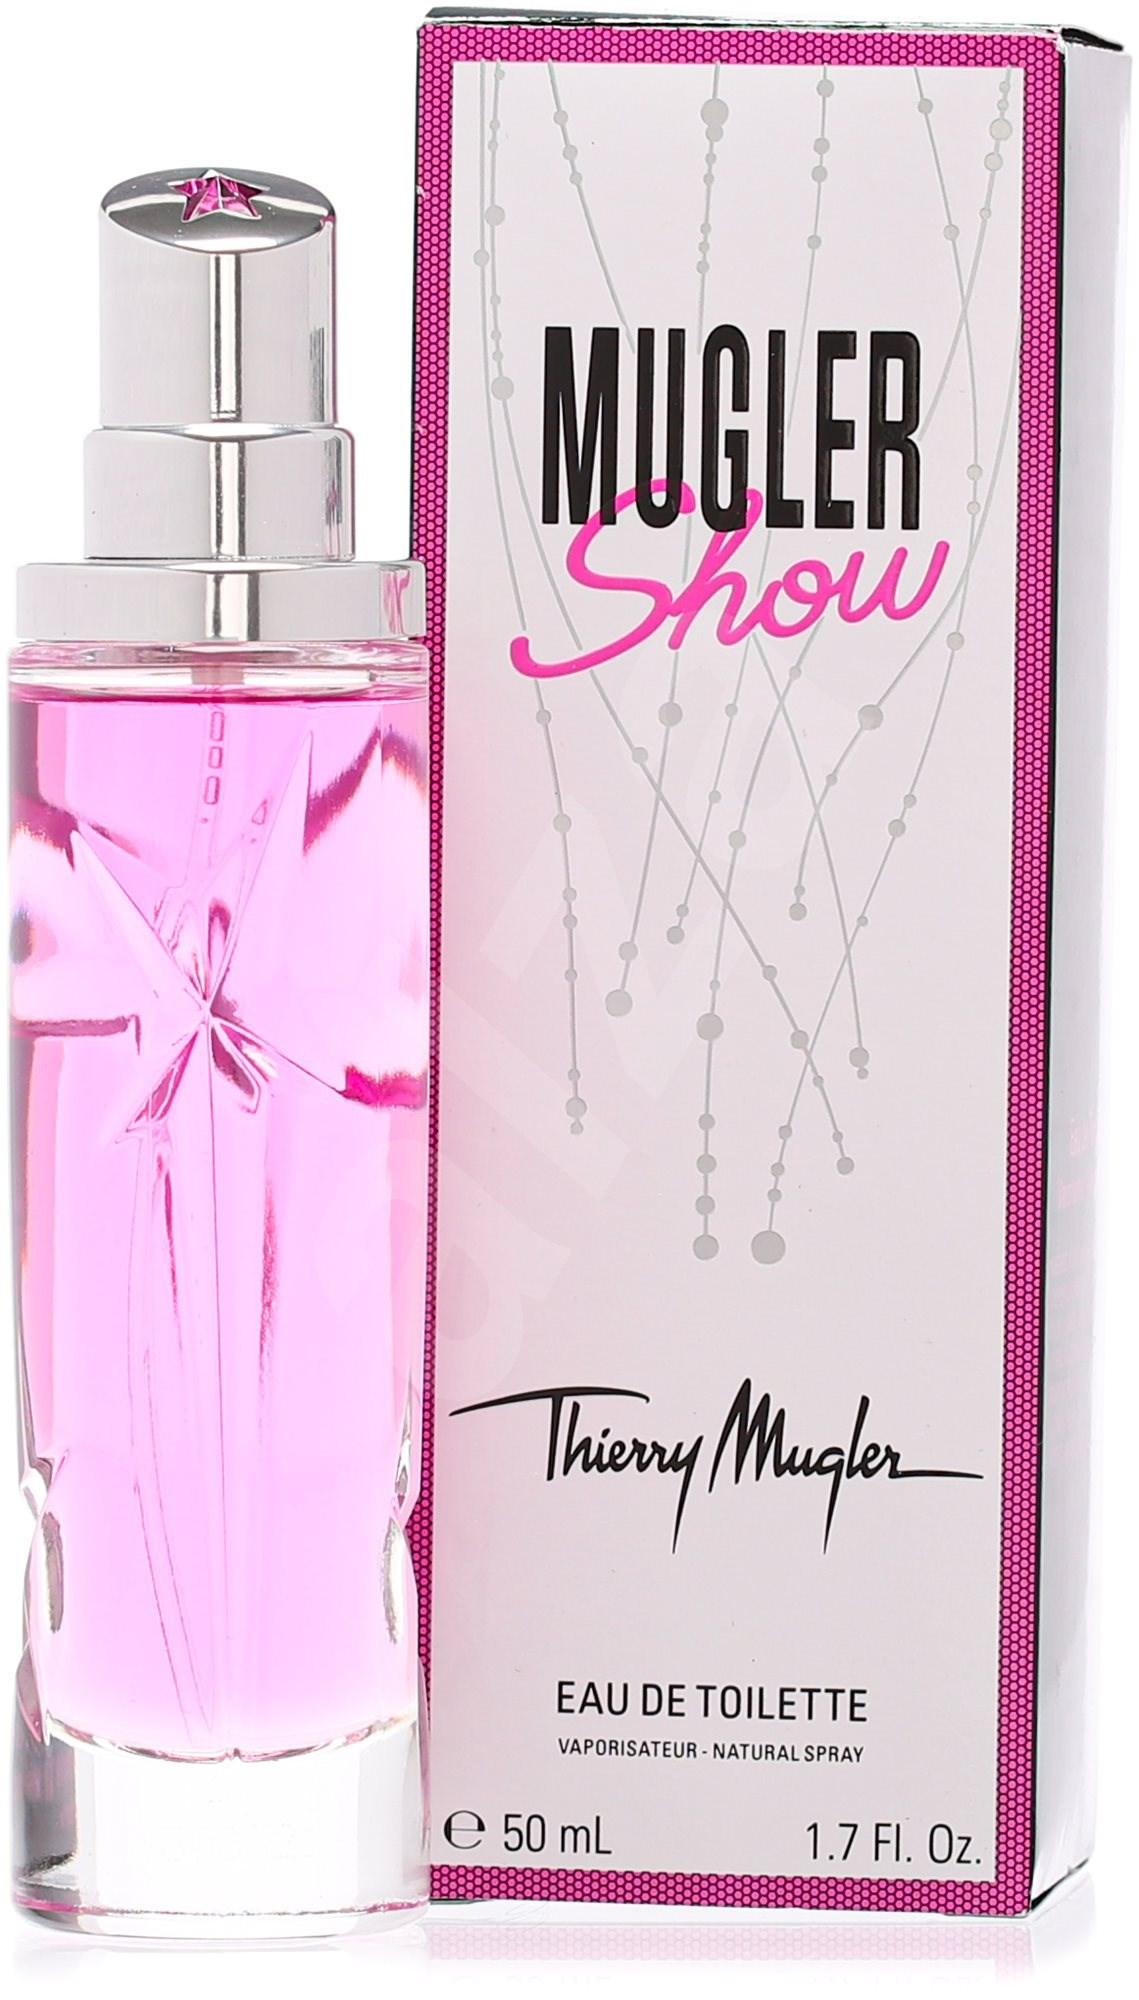 THIERRY MUGLER Mugler Show EdT 50 ml - Toalettvíz